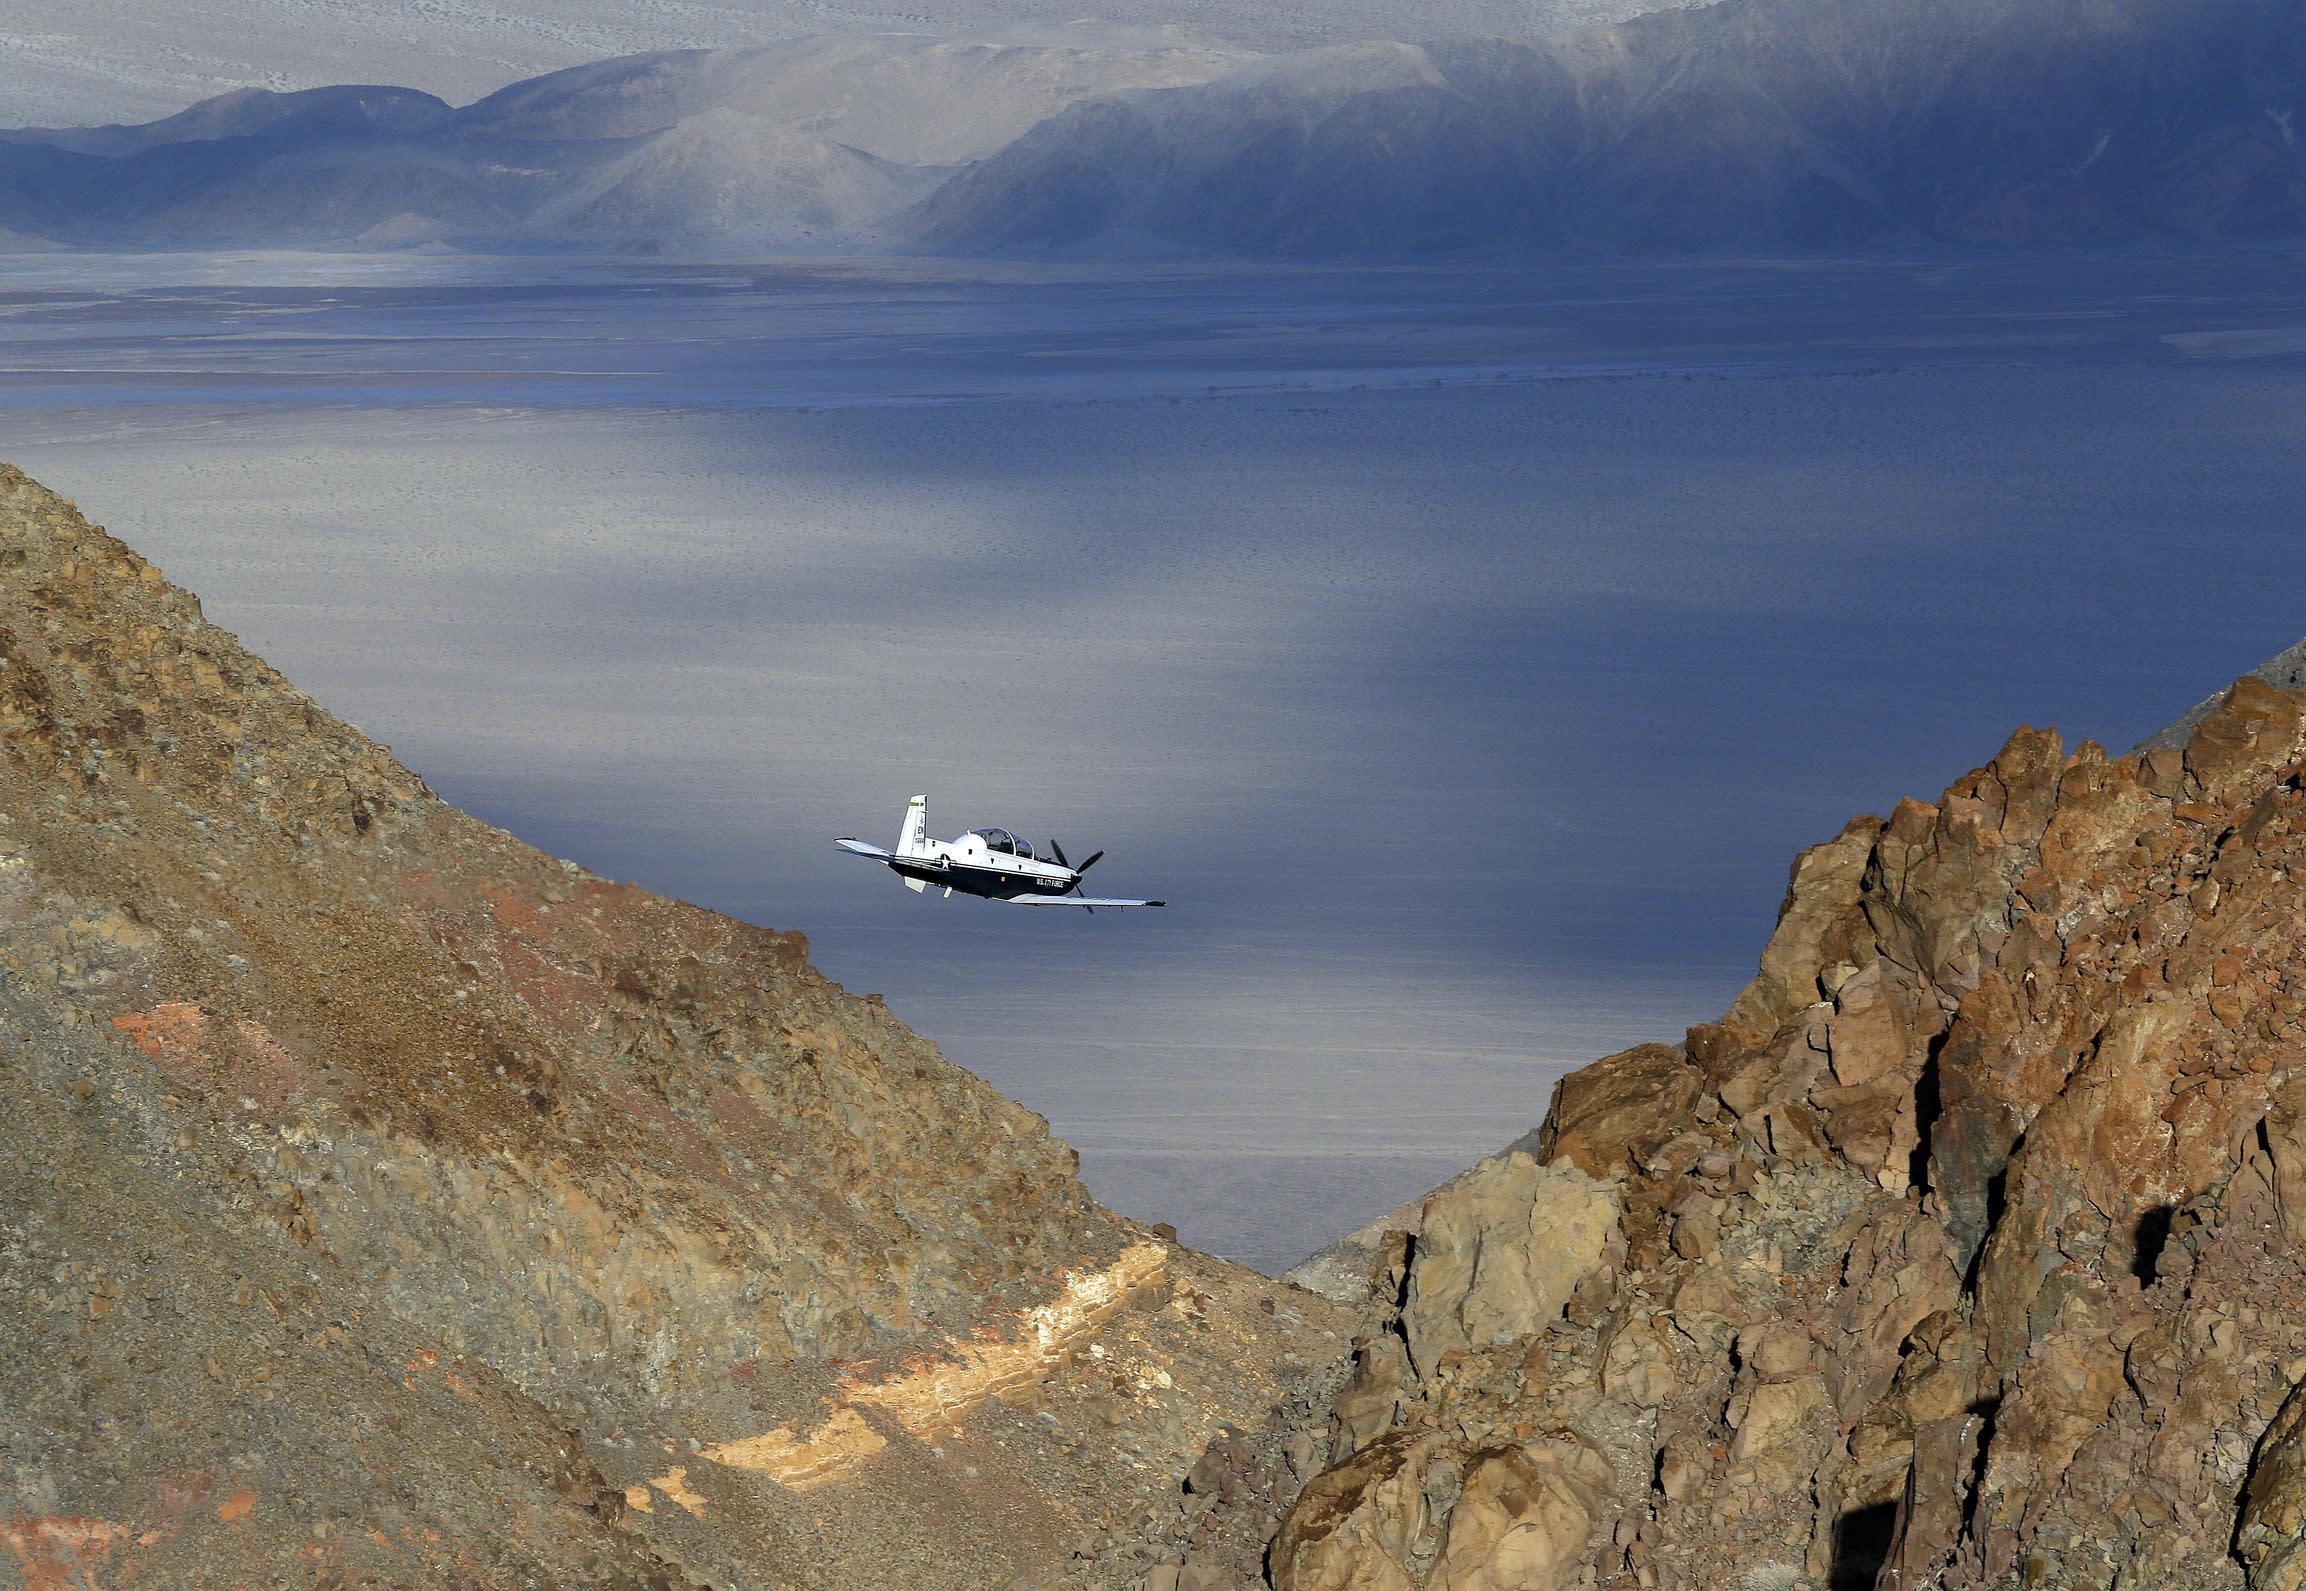 Navy confirms pilot died in jet crash in Death Valley